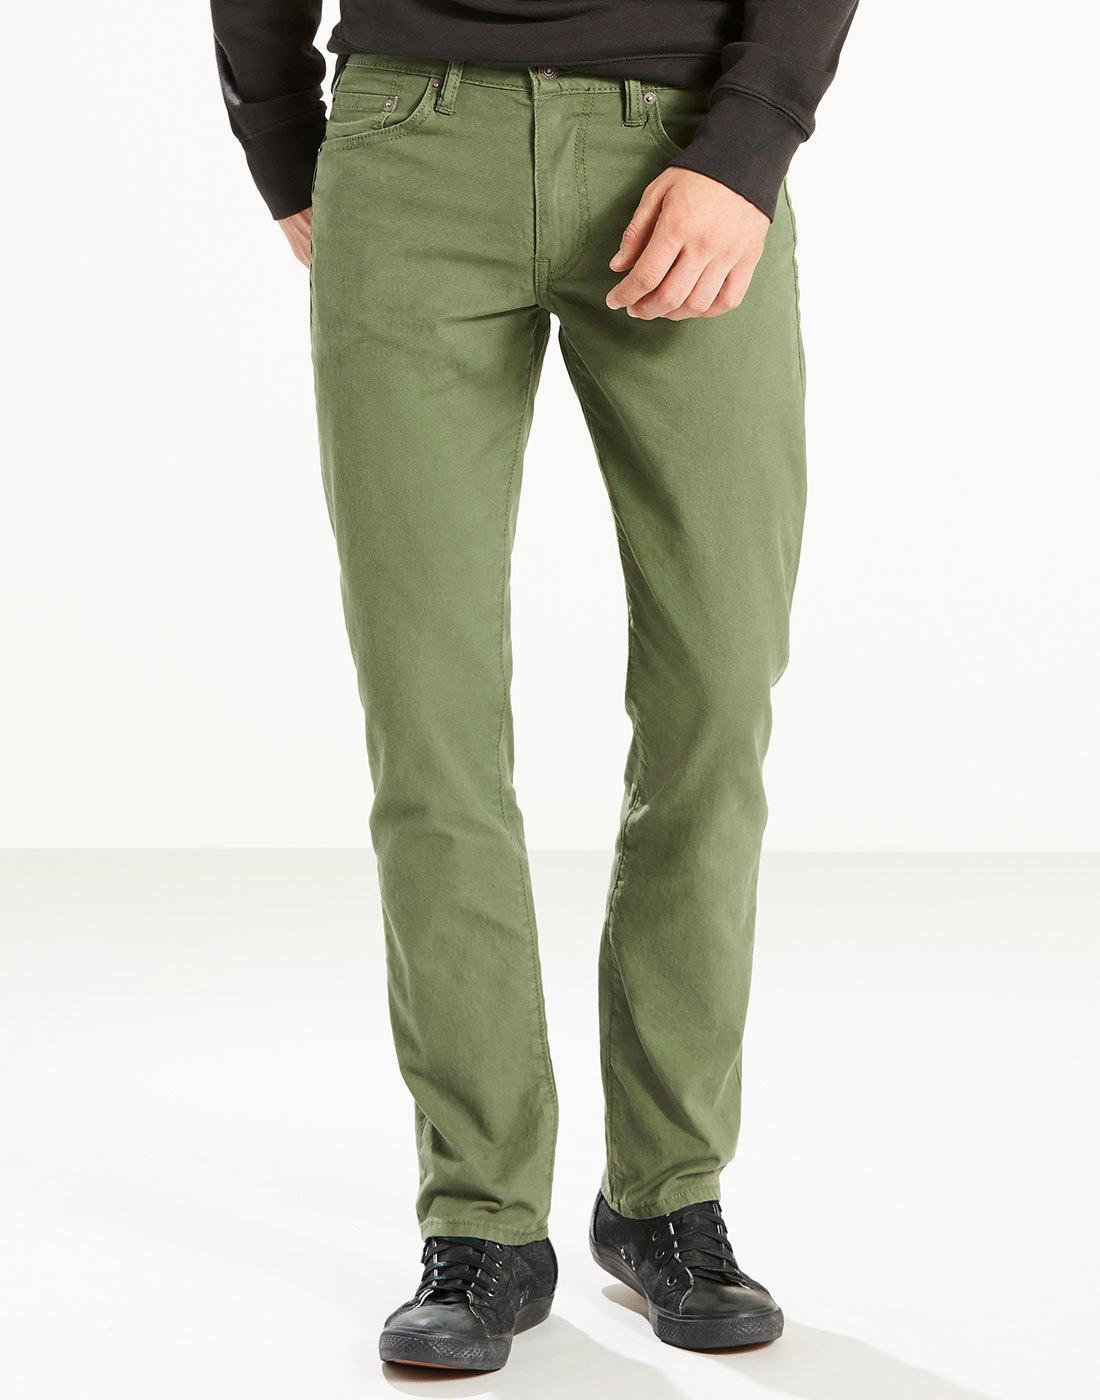 LEVI'S® 511 Retro Linen Mix Slim Jeans MEADOW MOSS